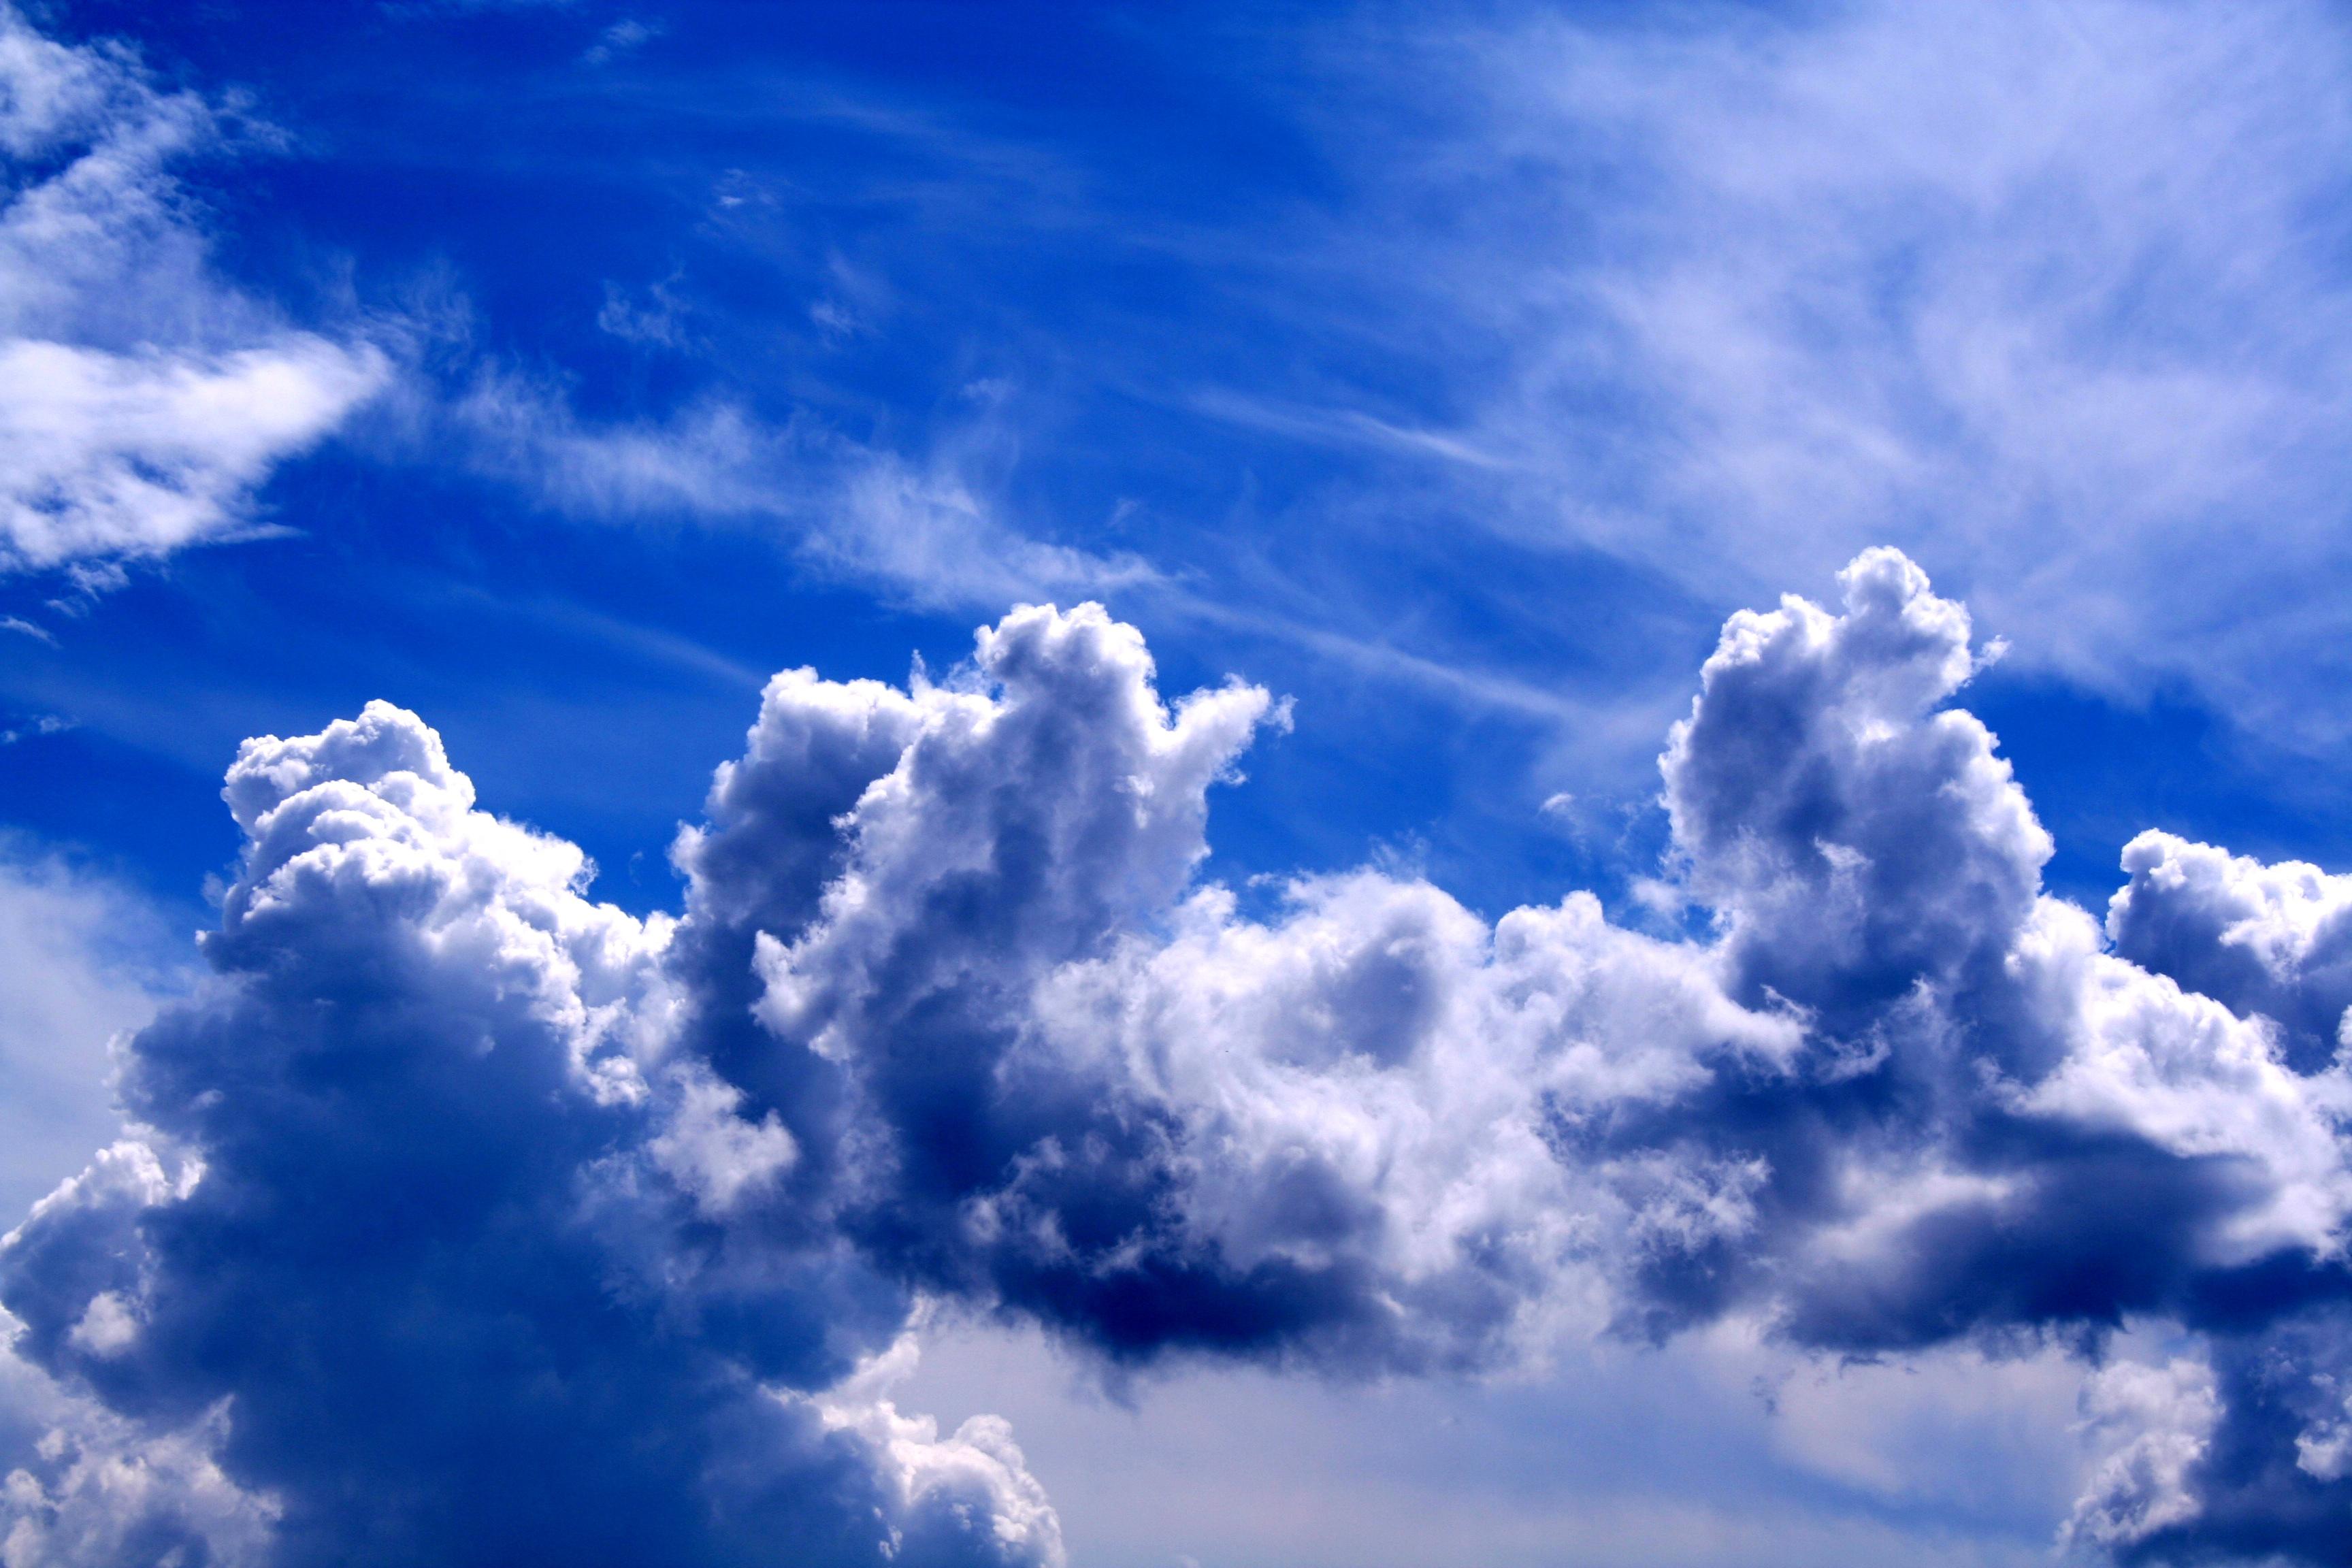 Sky mountains / 3456 x 2304 / Skyandclouds / Photography | MIRIADNA.COM